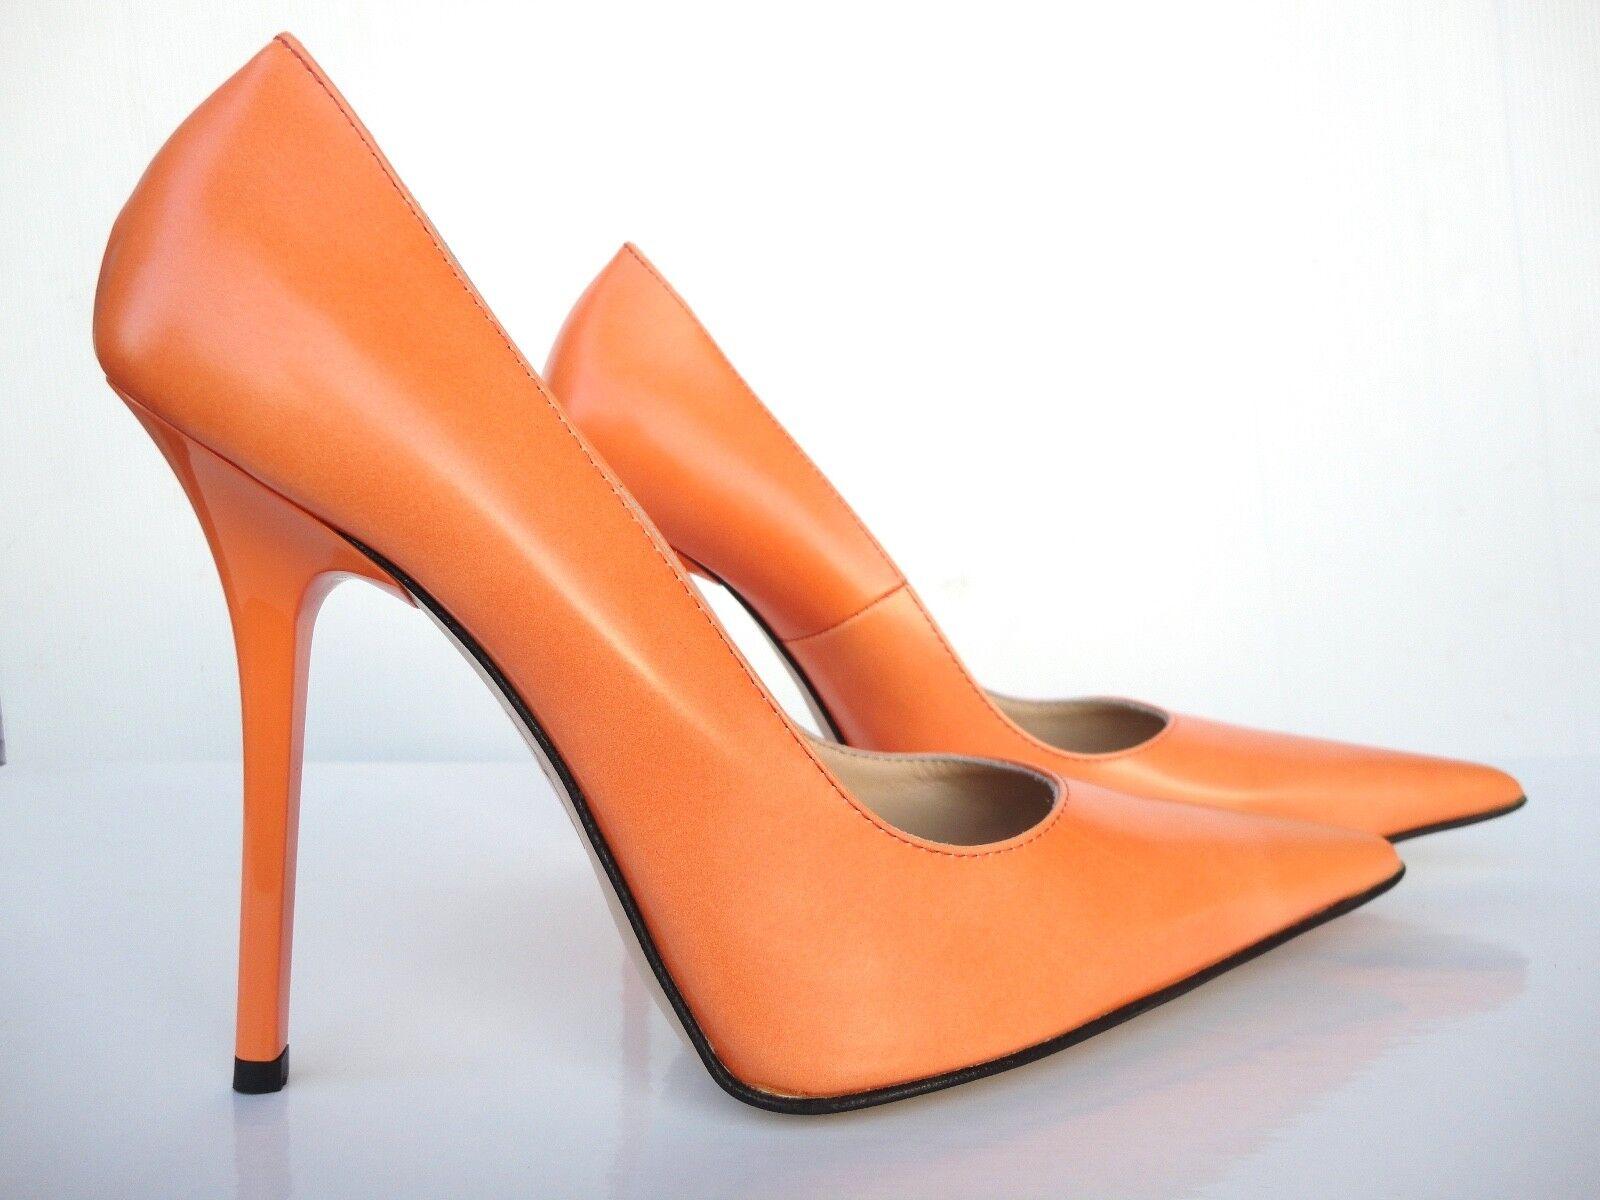 Schuhe orange pumps